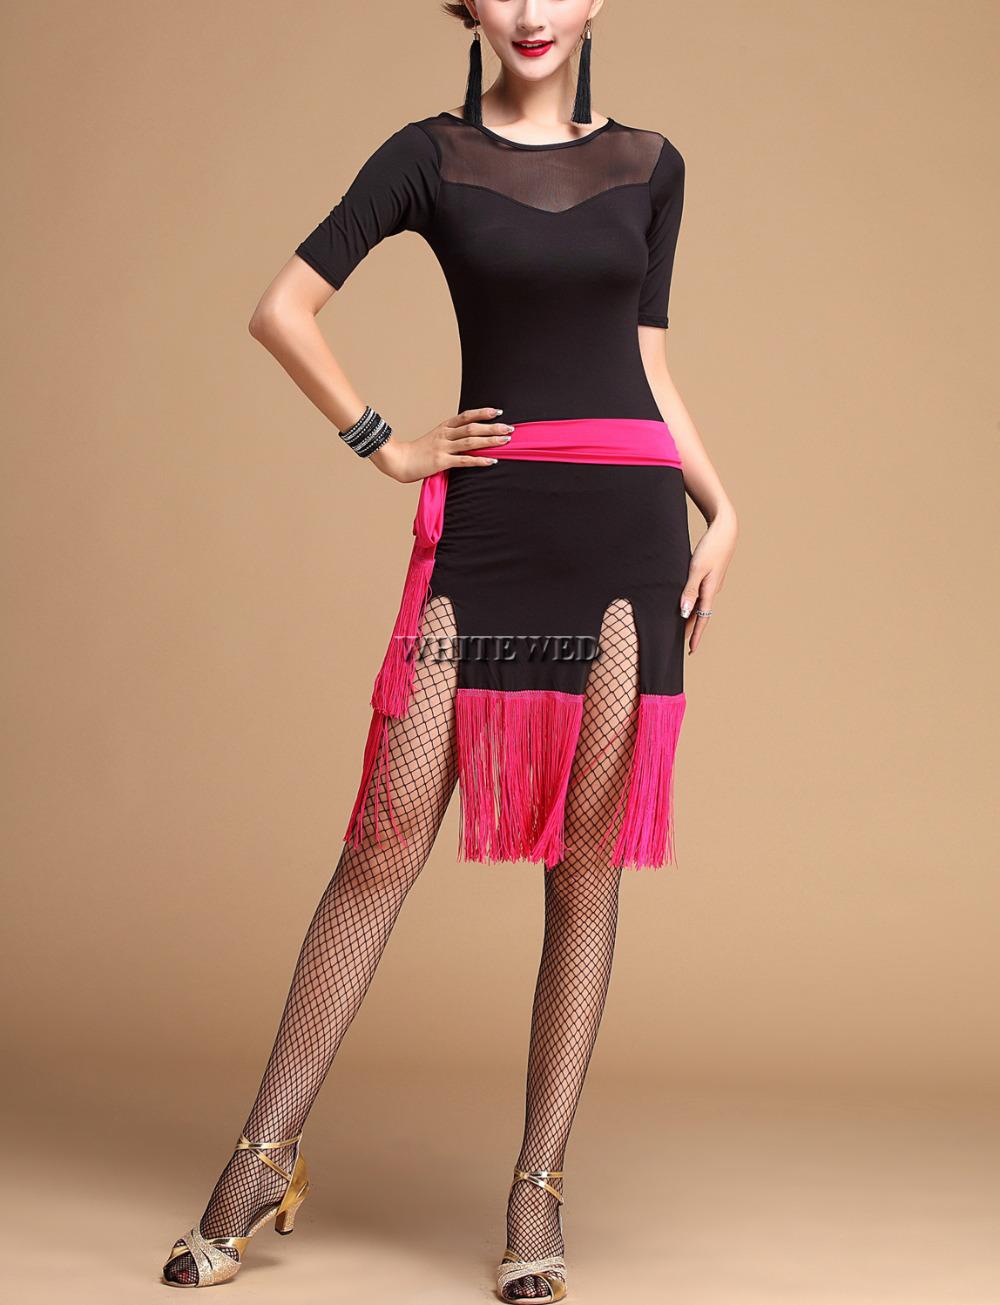 Vintage Dress Reproductions 113